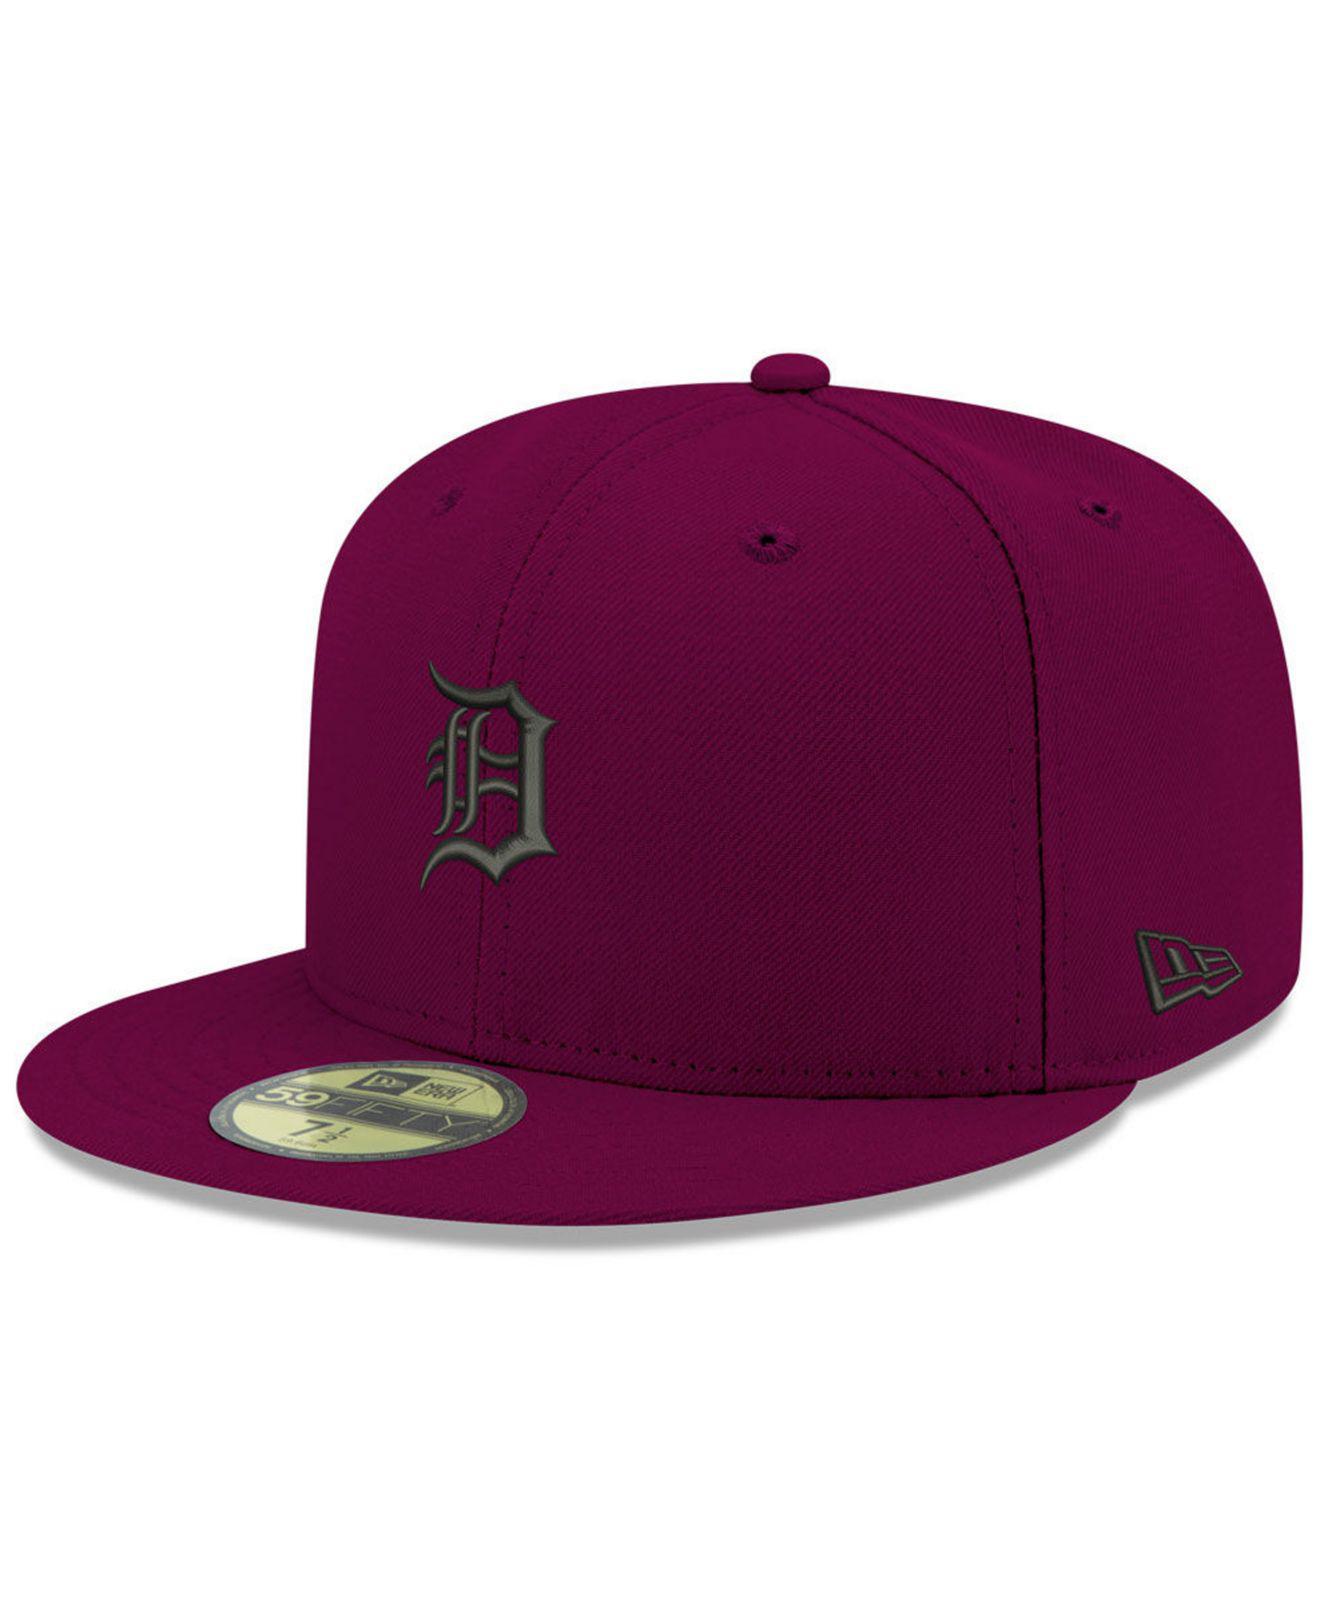 reputable site 30310 a7095 KTZ. Men s Purple Detroit Tigers Reverse C-dub 59fifty Fitted Cap